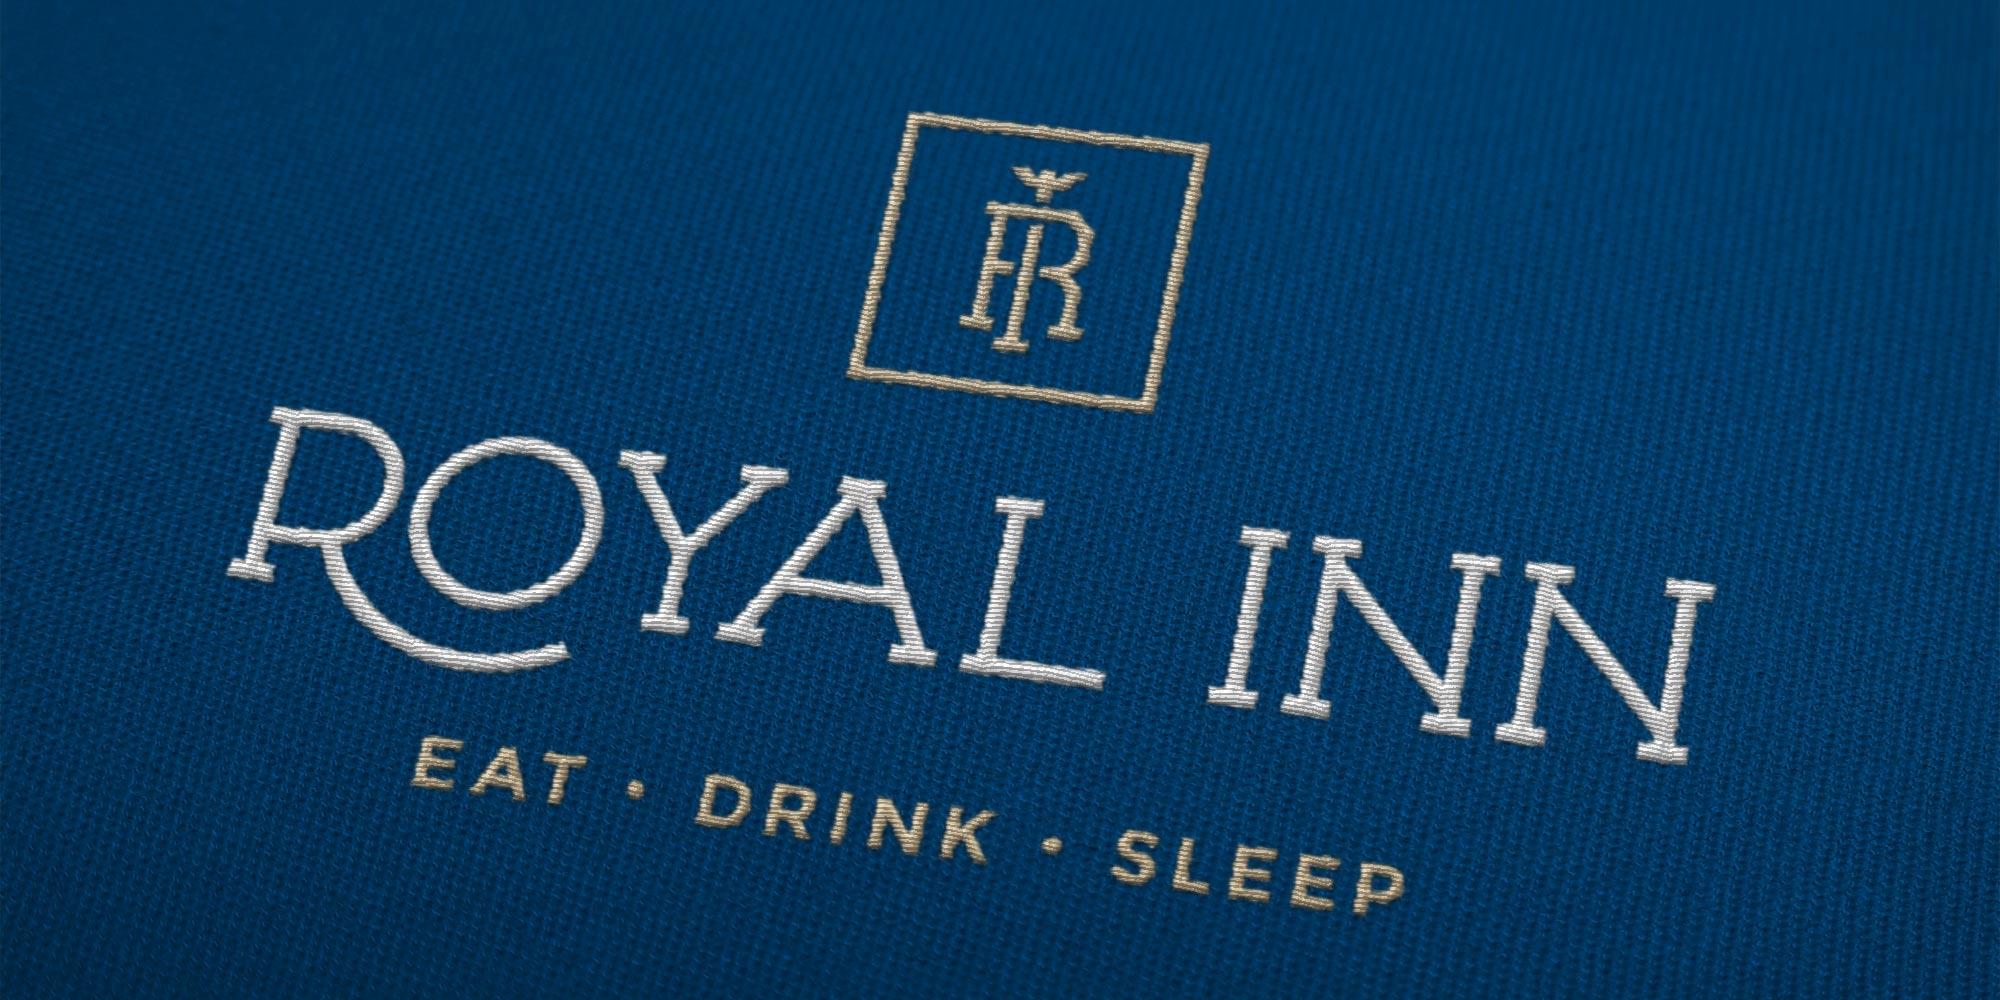 Royal Inn Logo Design on Staff Uniform